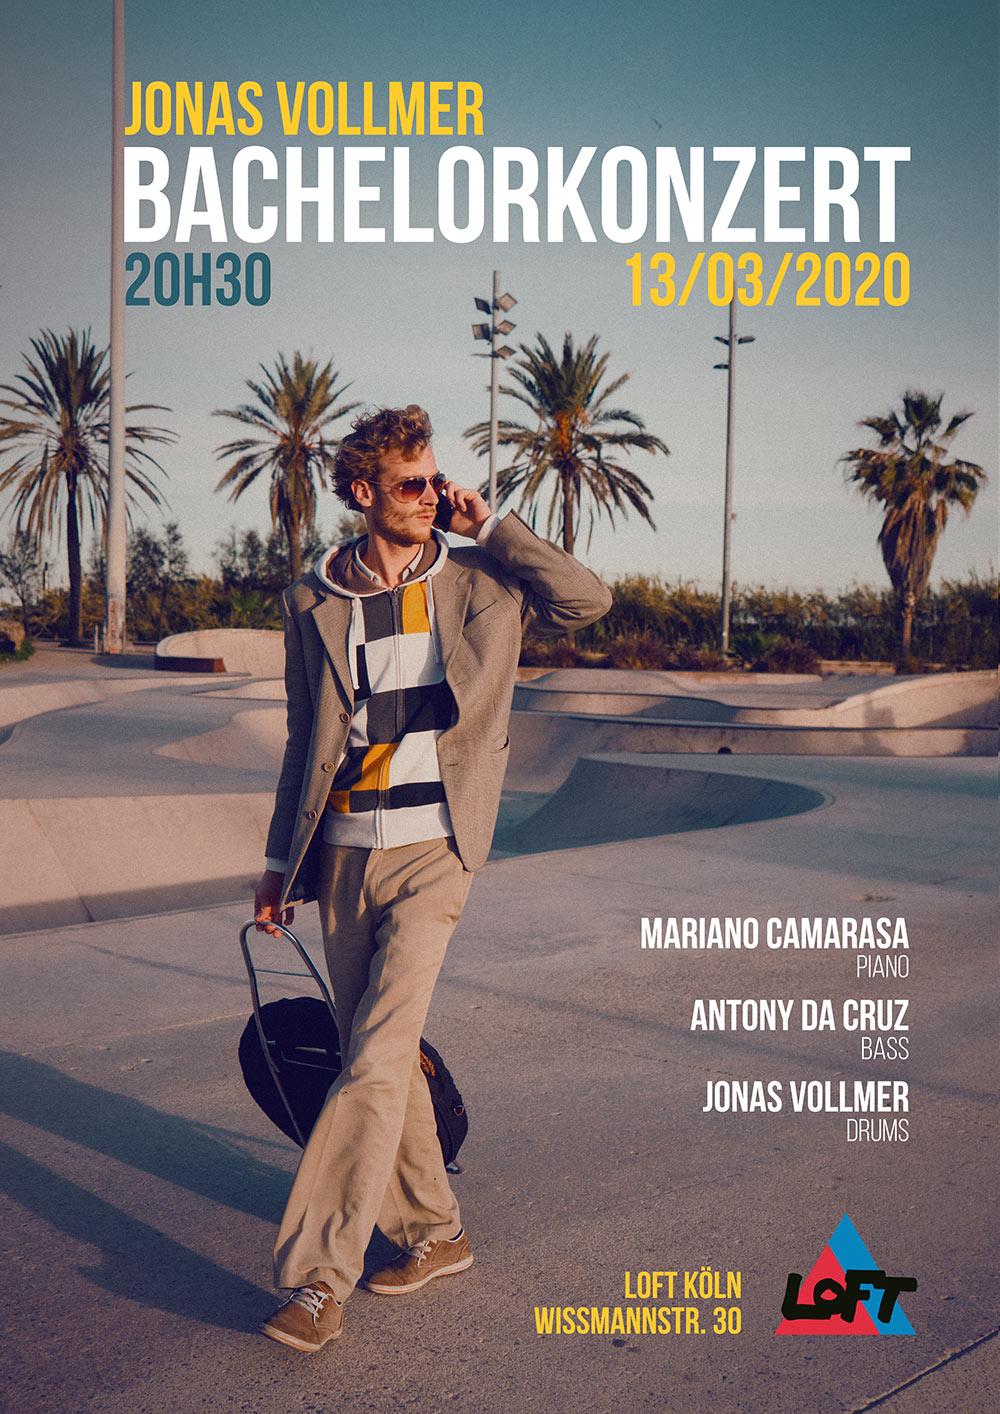 Bachelorabschlusskonzert LOFT Köln Cologne Mariano Camarasa Antony Da Cruz Jonas Vollmer